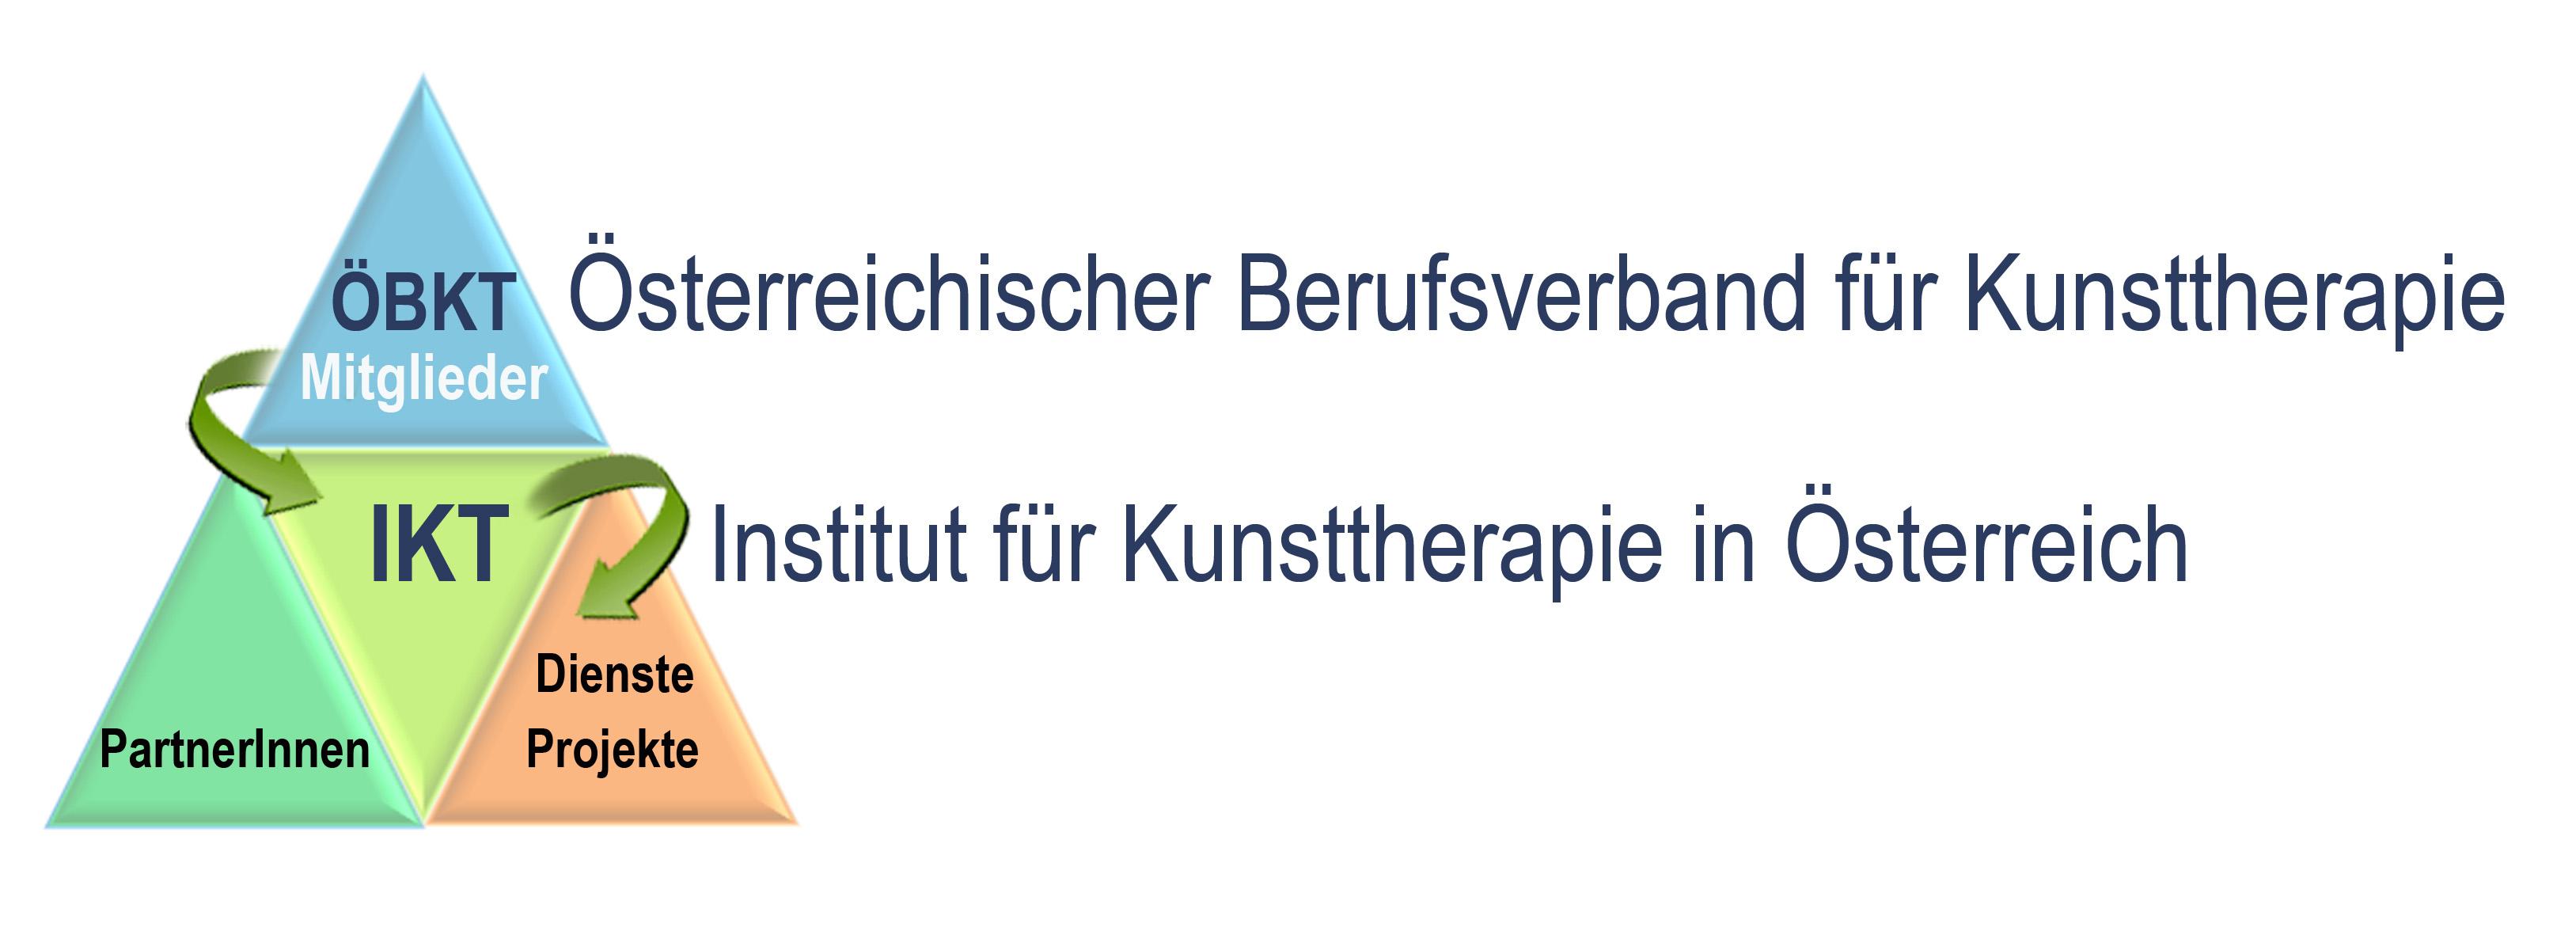 https://www.ikt.or.at/wp-content/uploads/2015/03/Verein.jpg